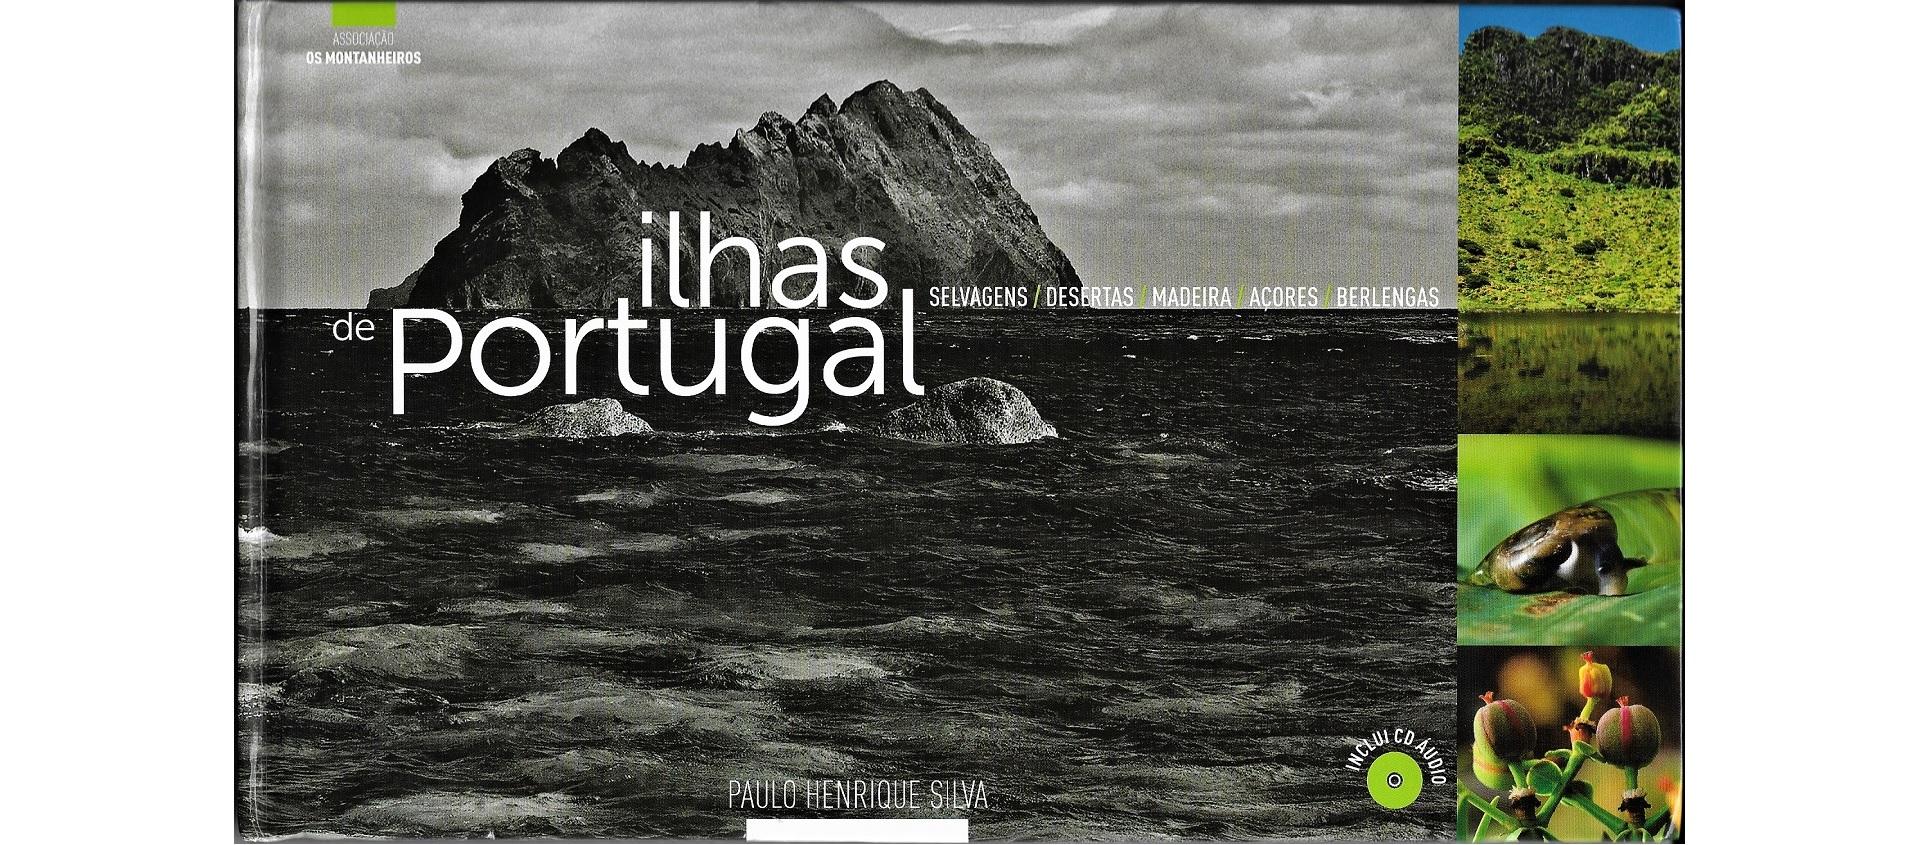 Ilhas de Portugal